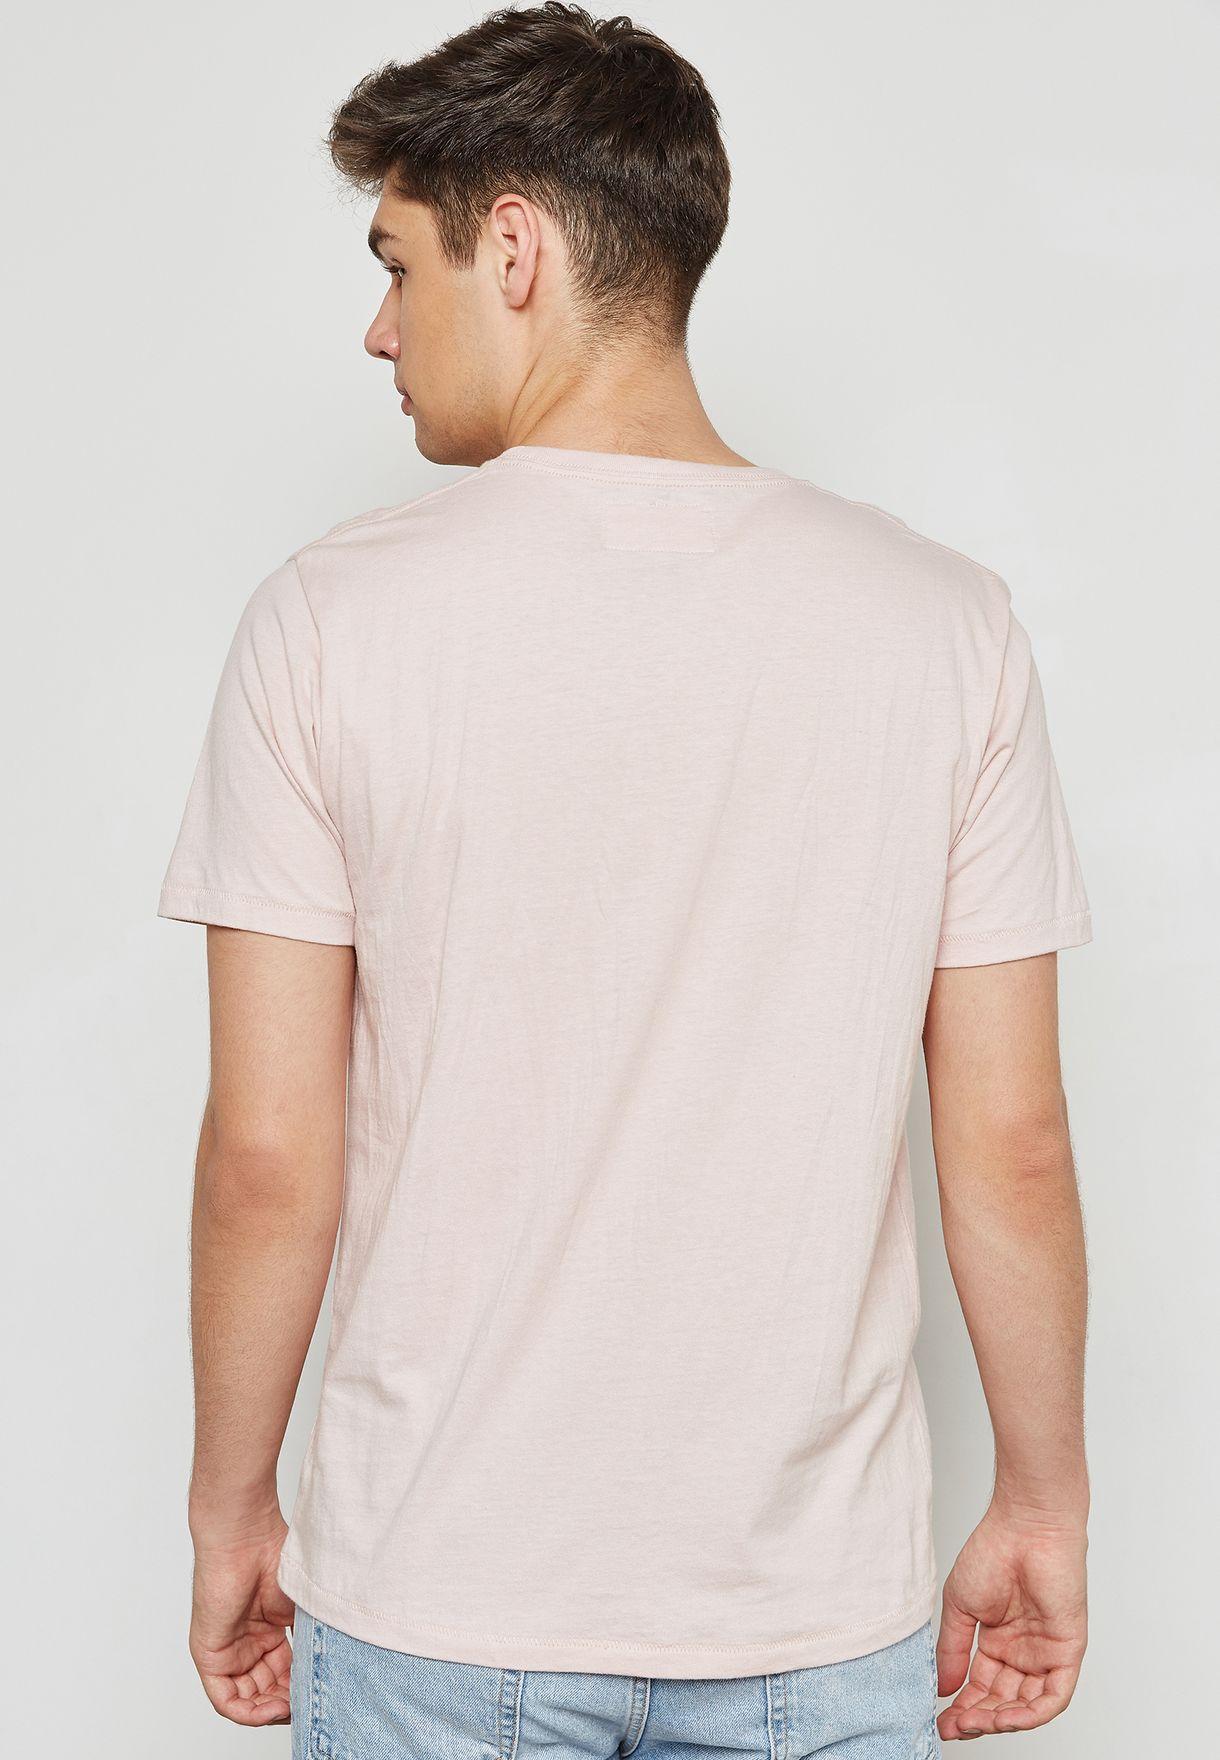 Cools T-Shirt